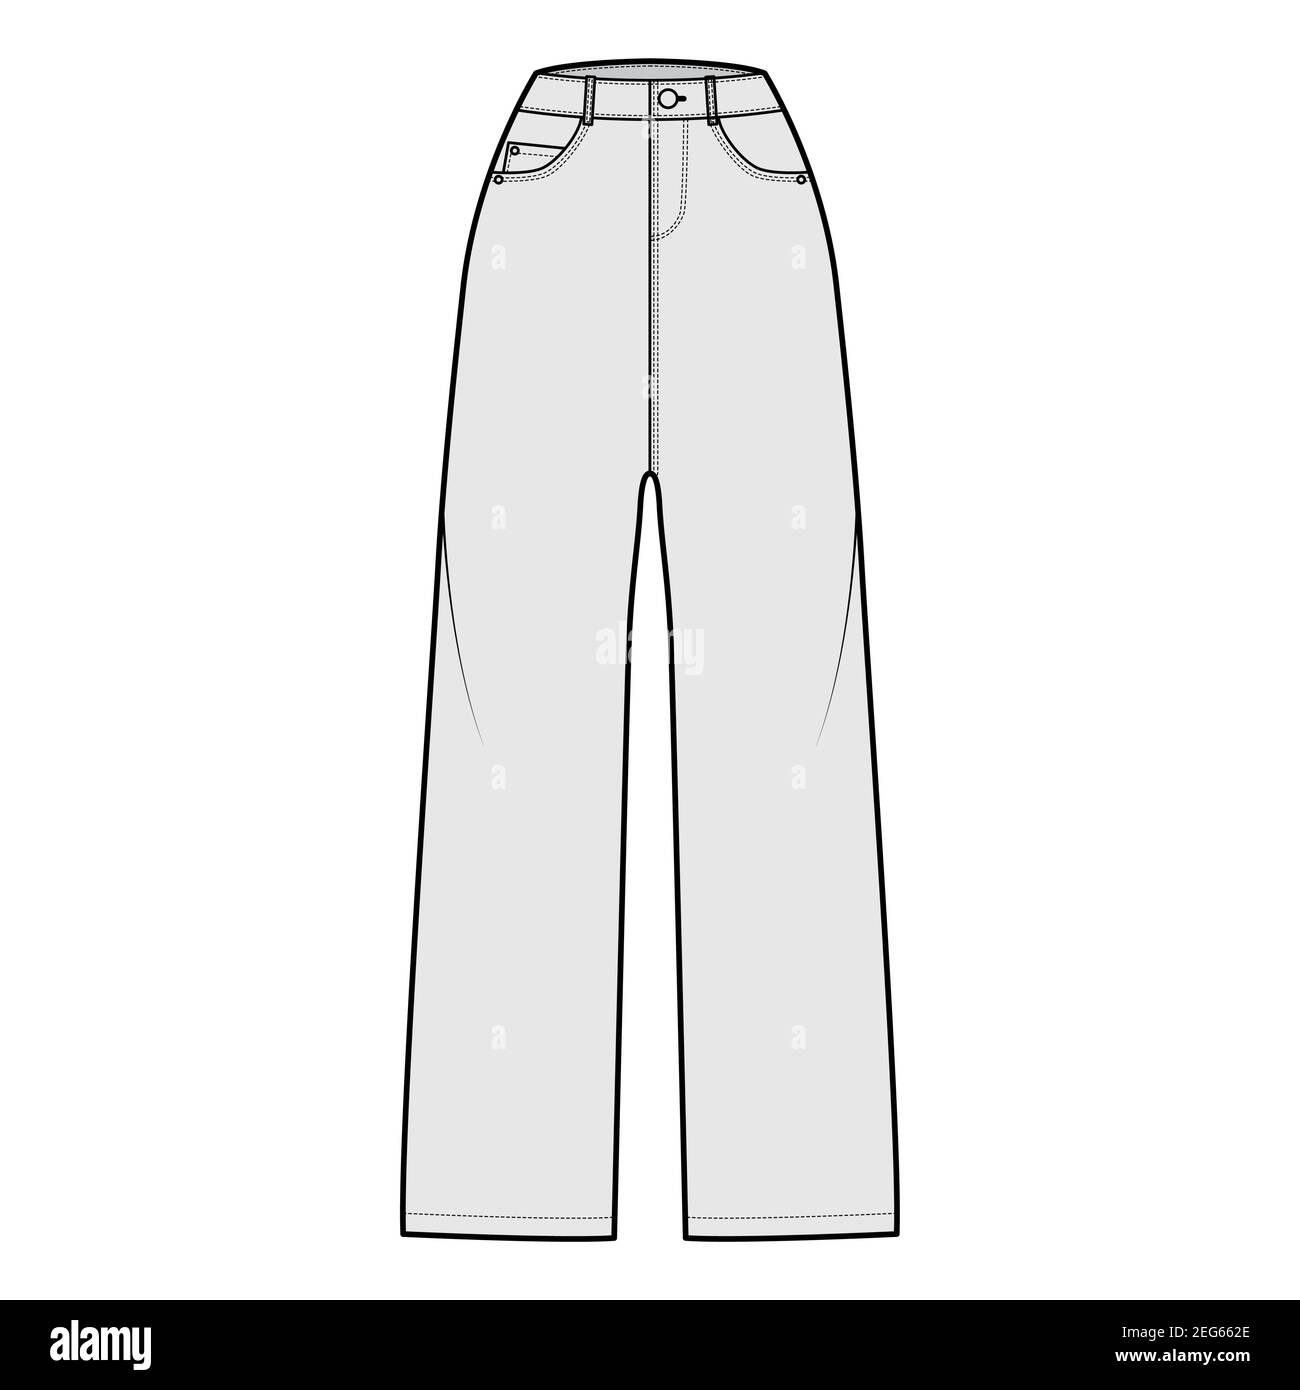 Wearing baggy pants girls Yahoo is